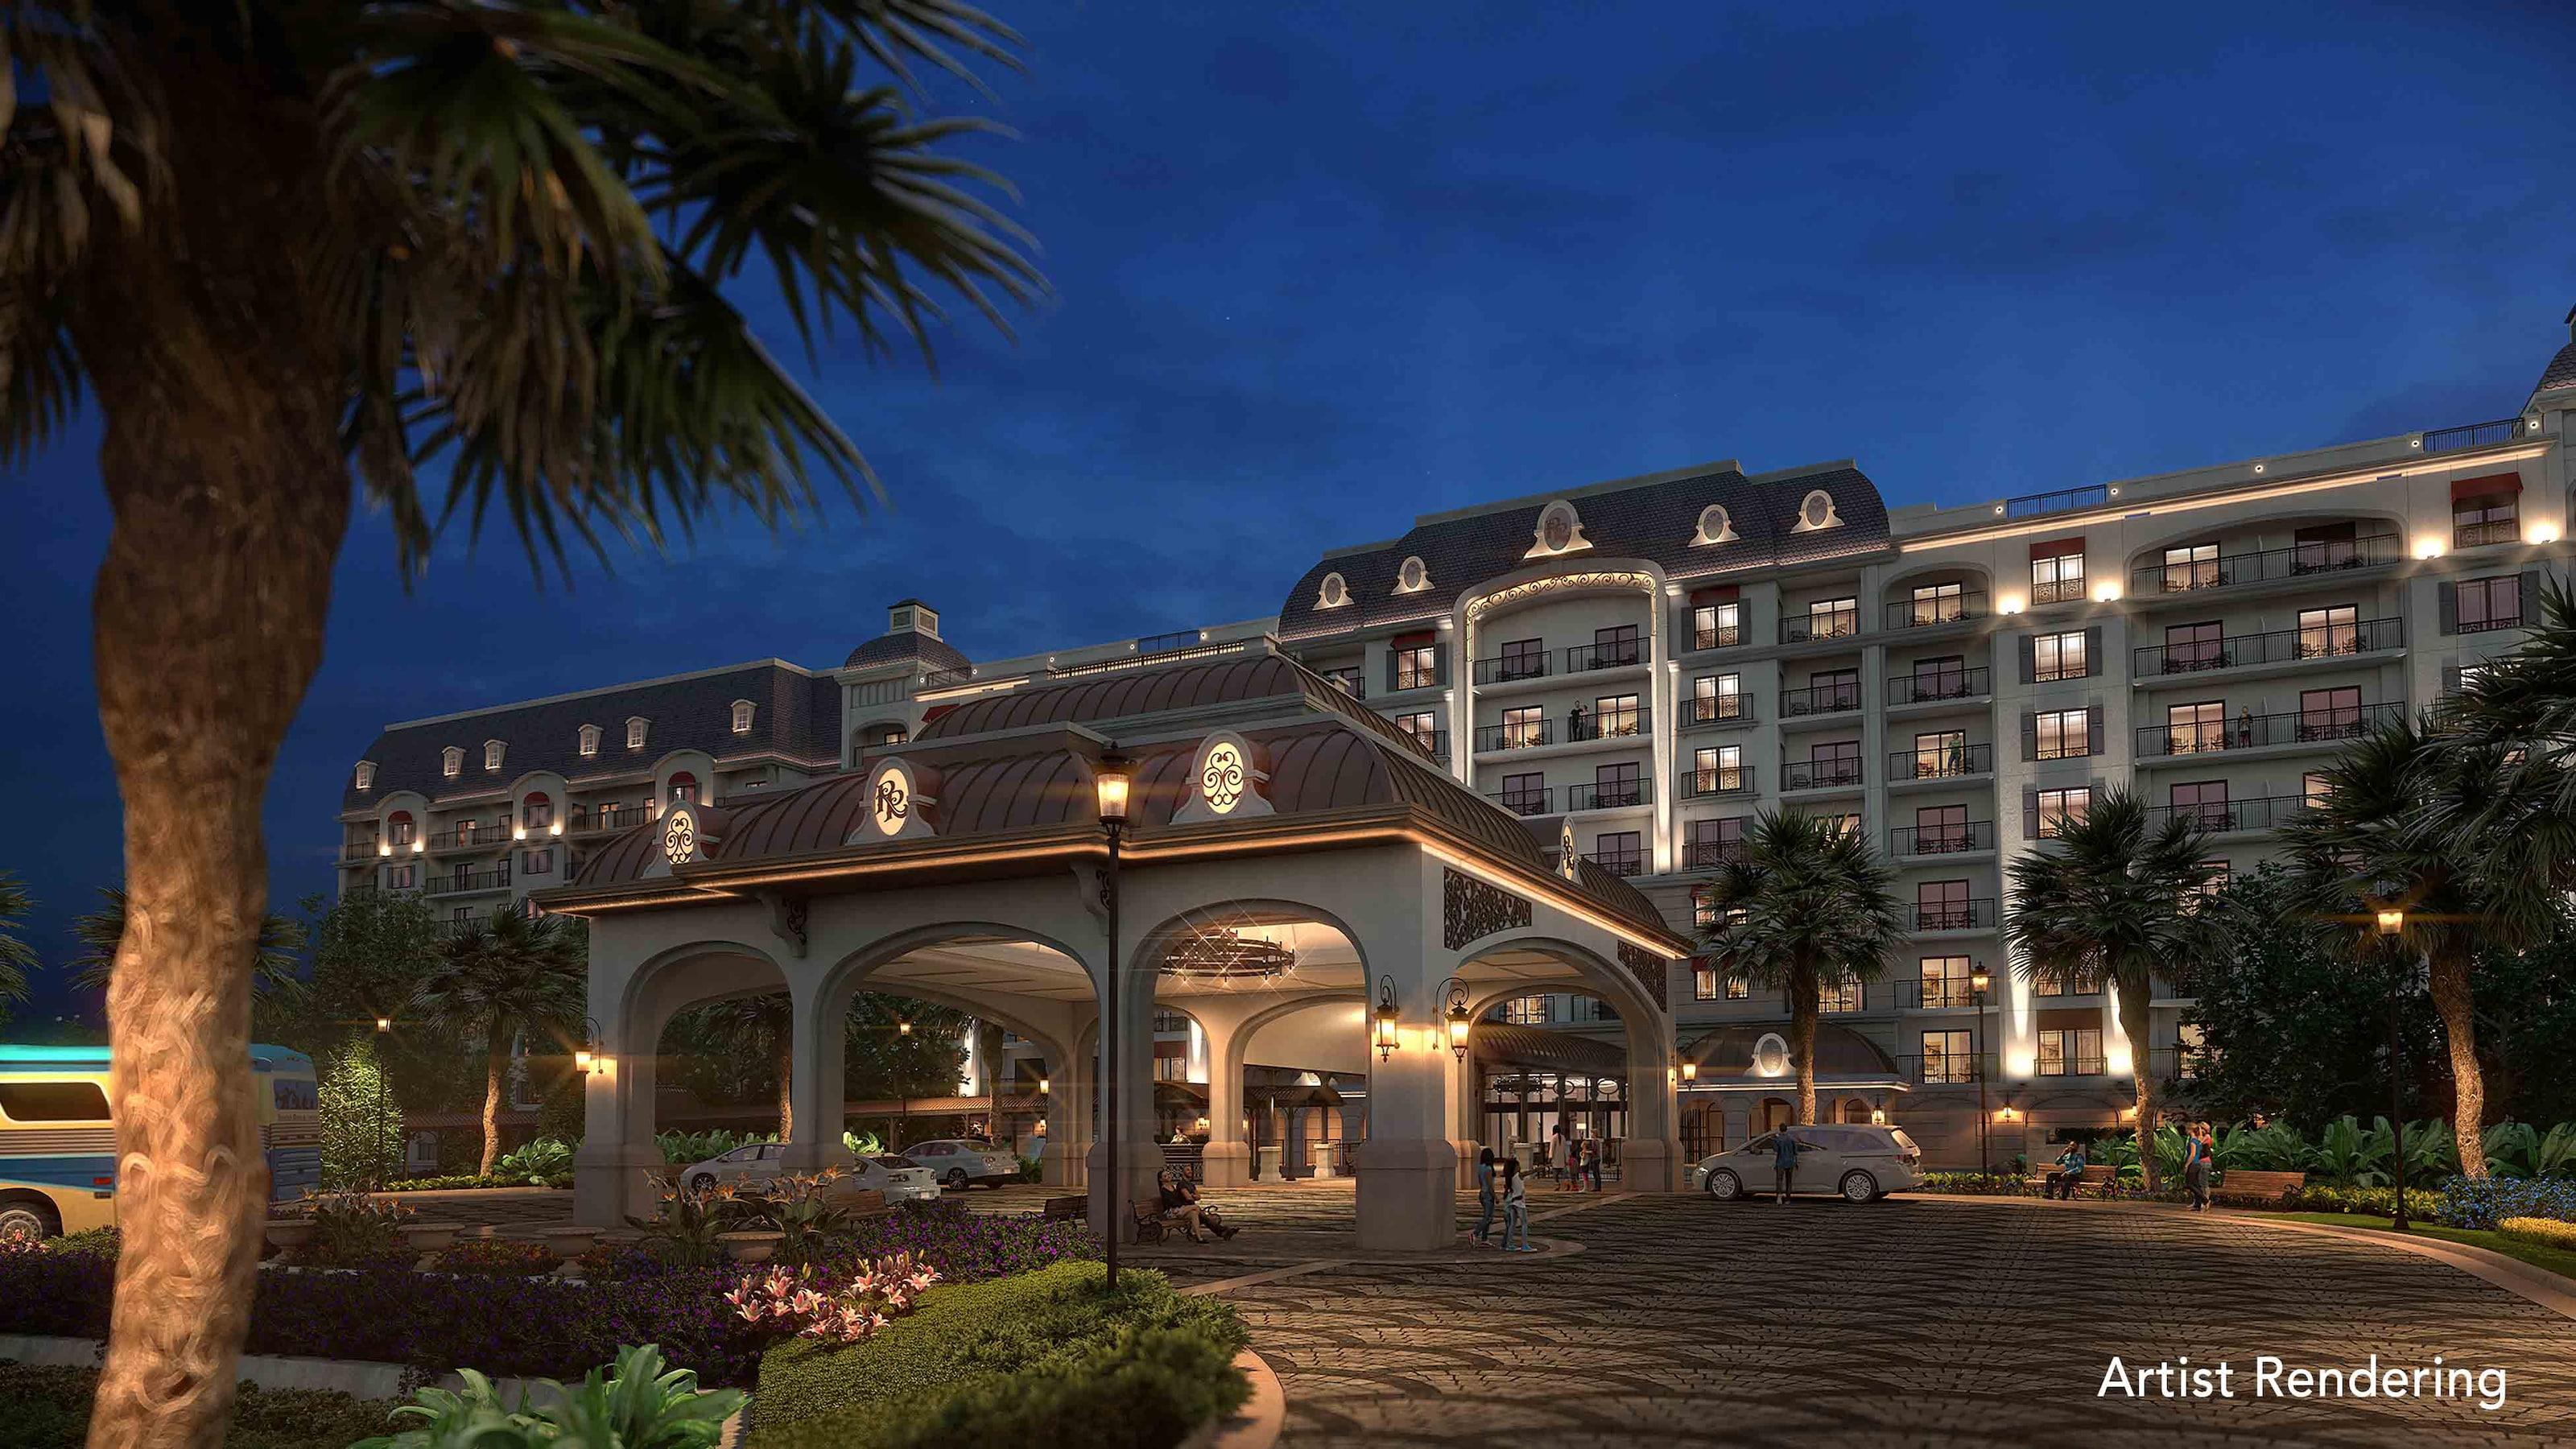 The entrance and porte cochere of Disney's Riviera Resort, illuminated at night